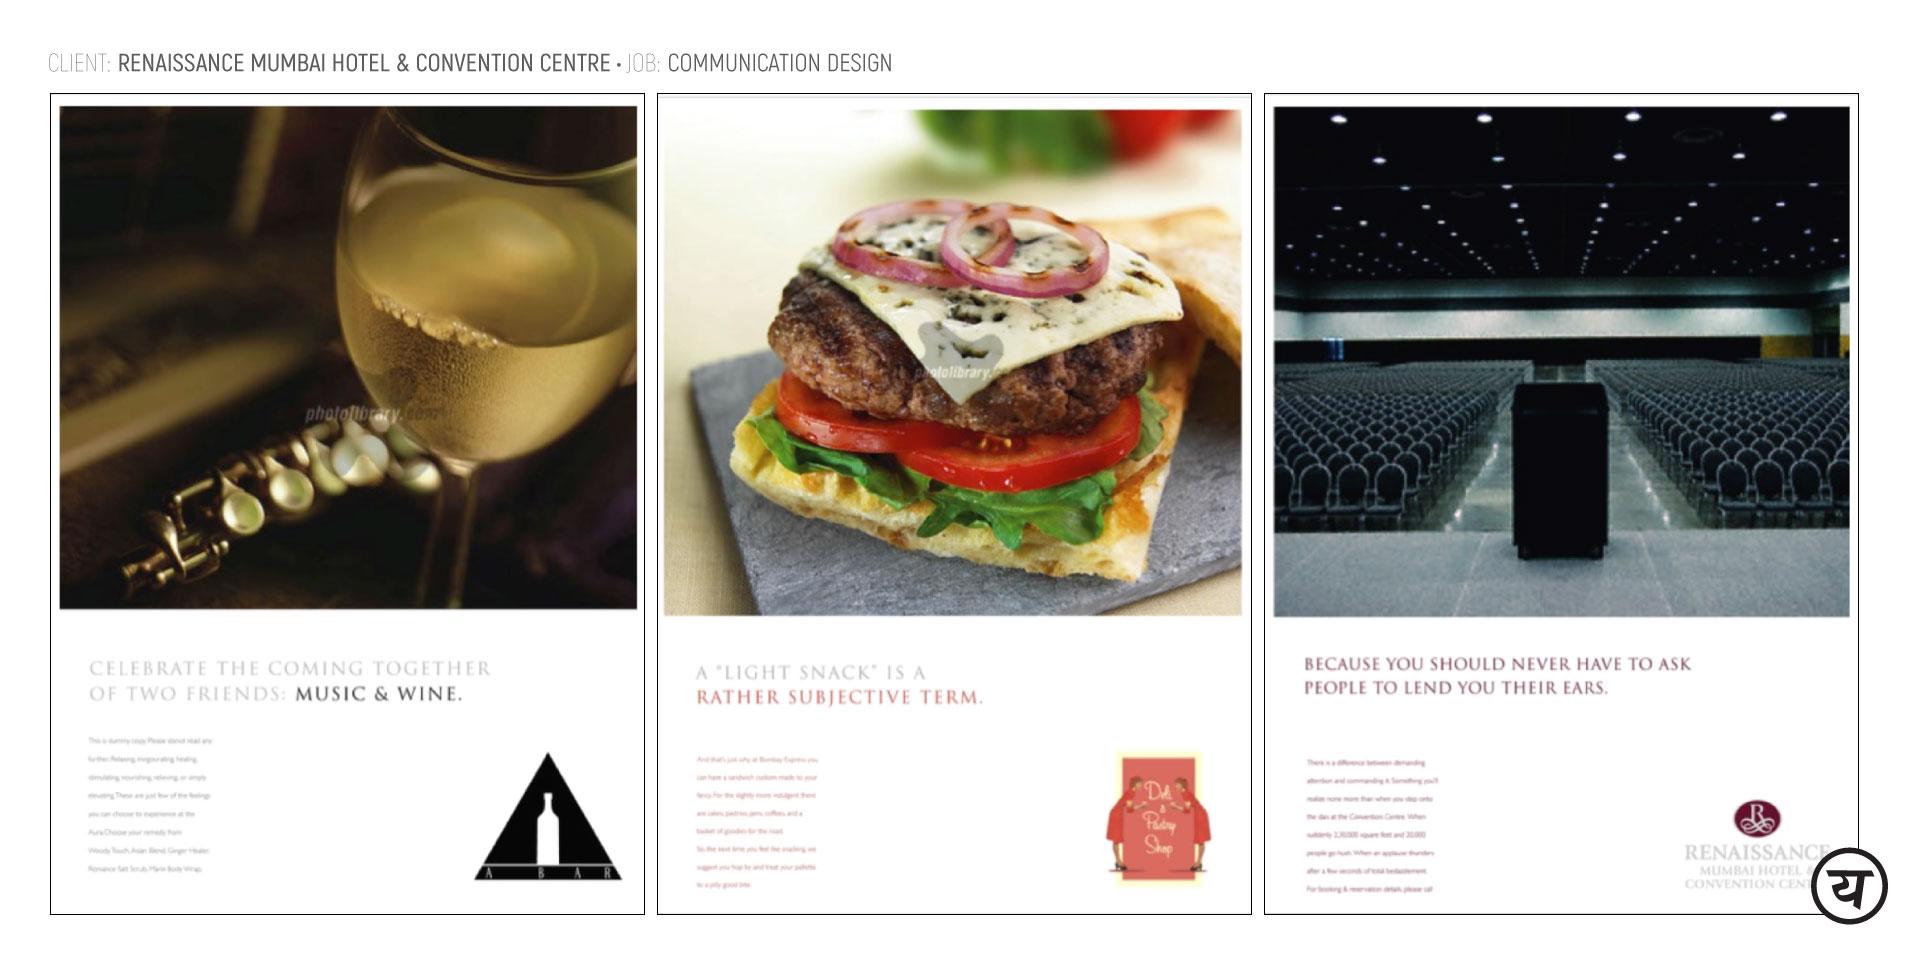 YesYesWhyNot_Communication-Design_Marriott-#5_04.08.19